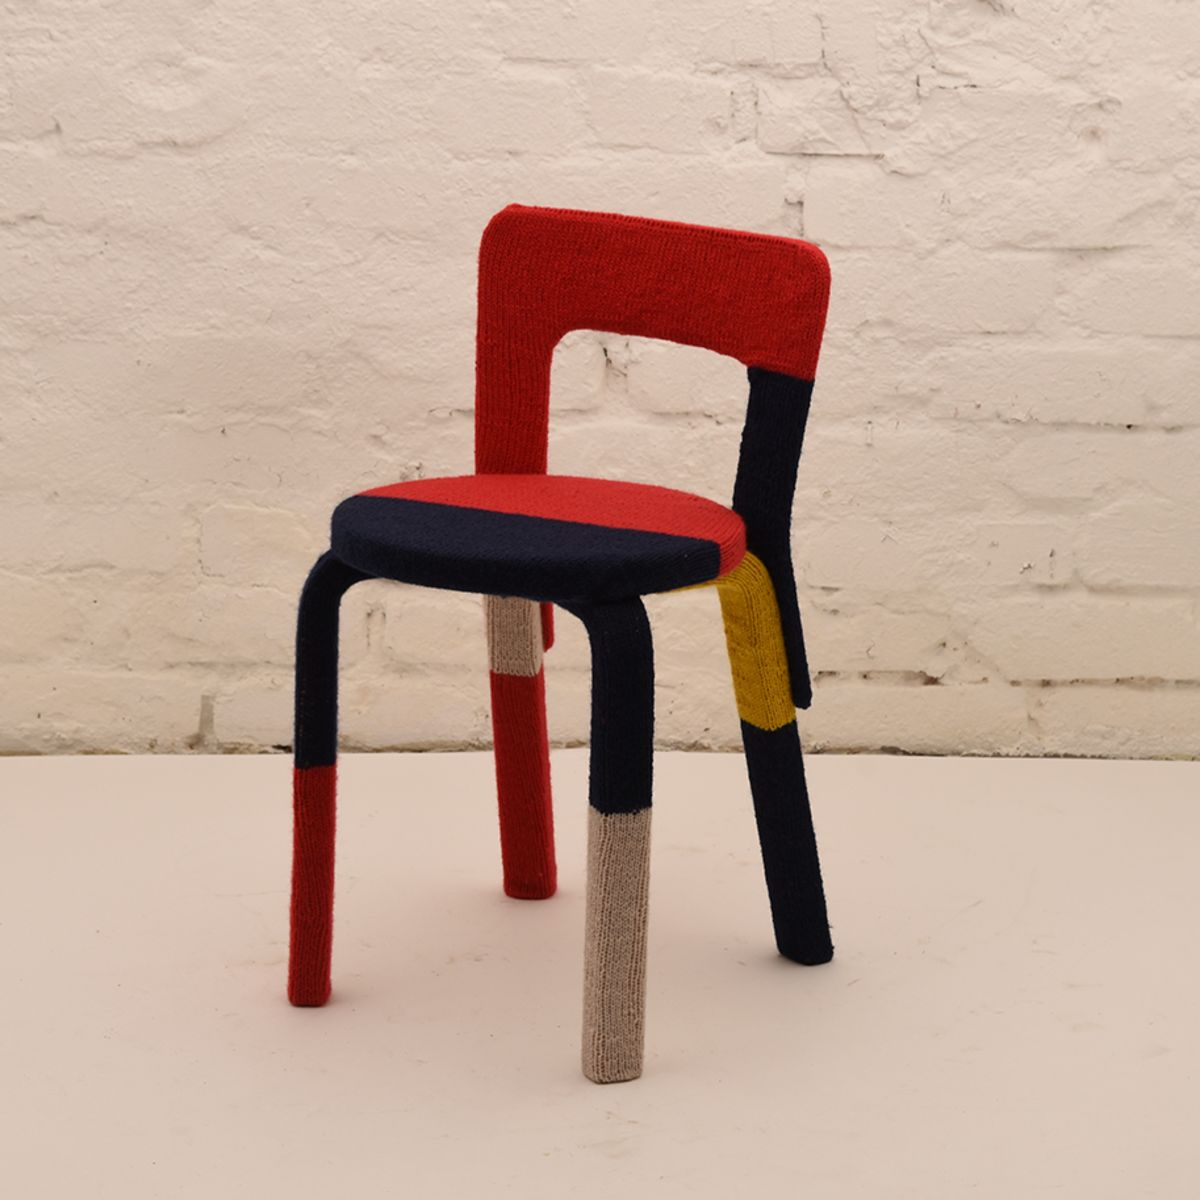 Alvar-Aalto-Eija-Zweygberg_Wool-Covered-65-Chair_A